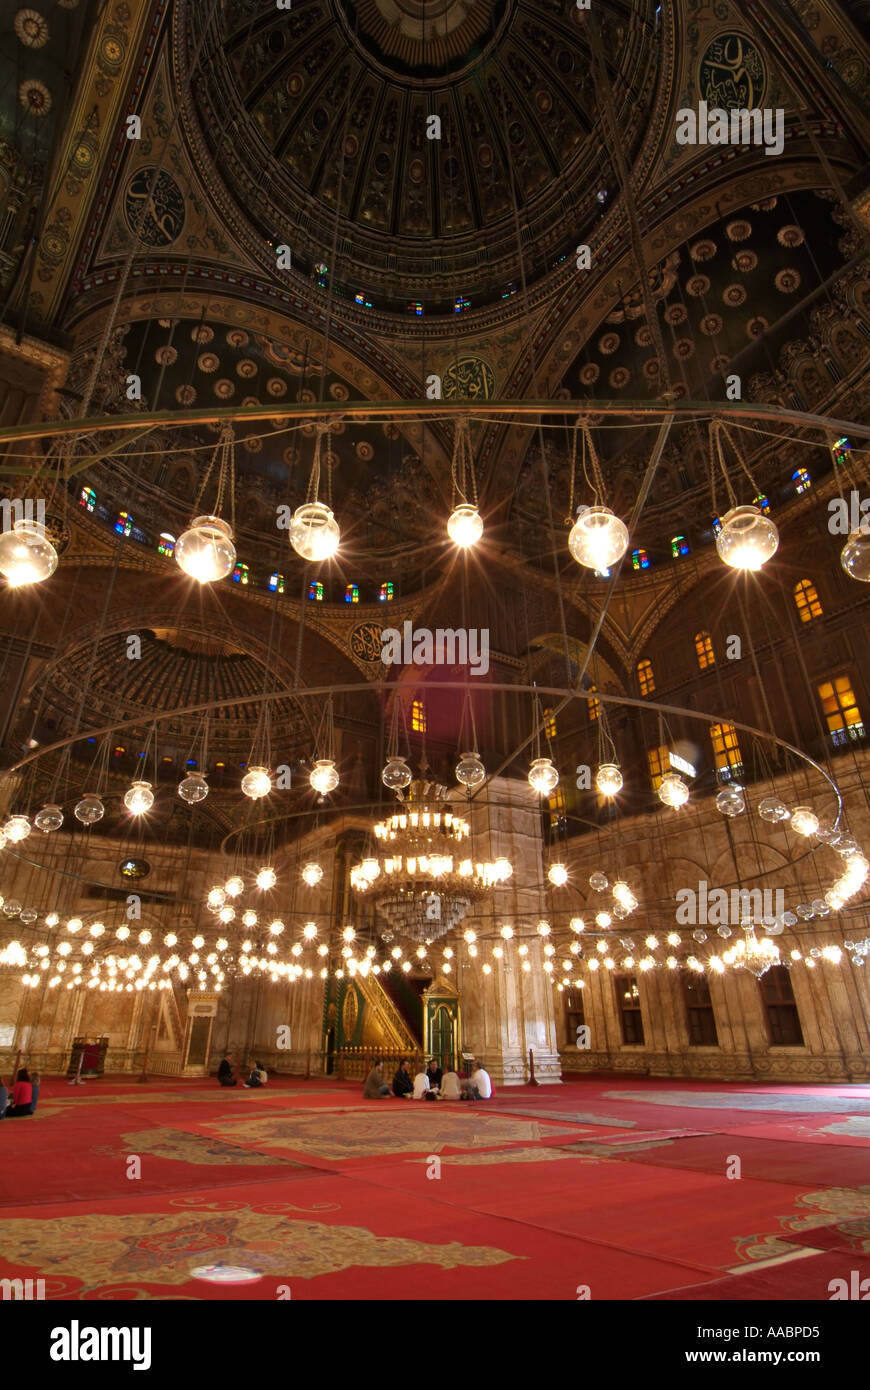 Prayer room, Muhammad Ali Mosque, Citadel, Cairo, Egypt - Stock Image